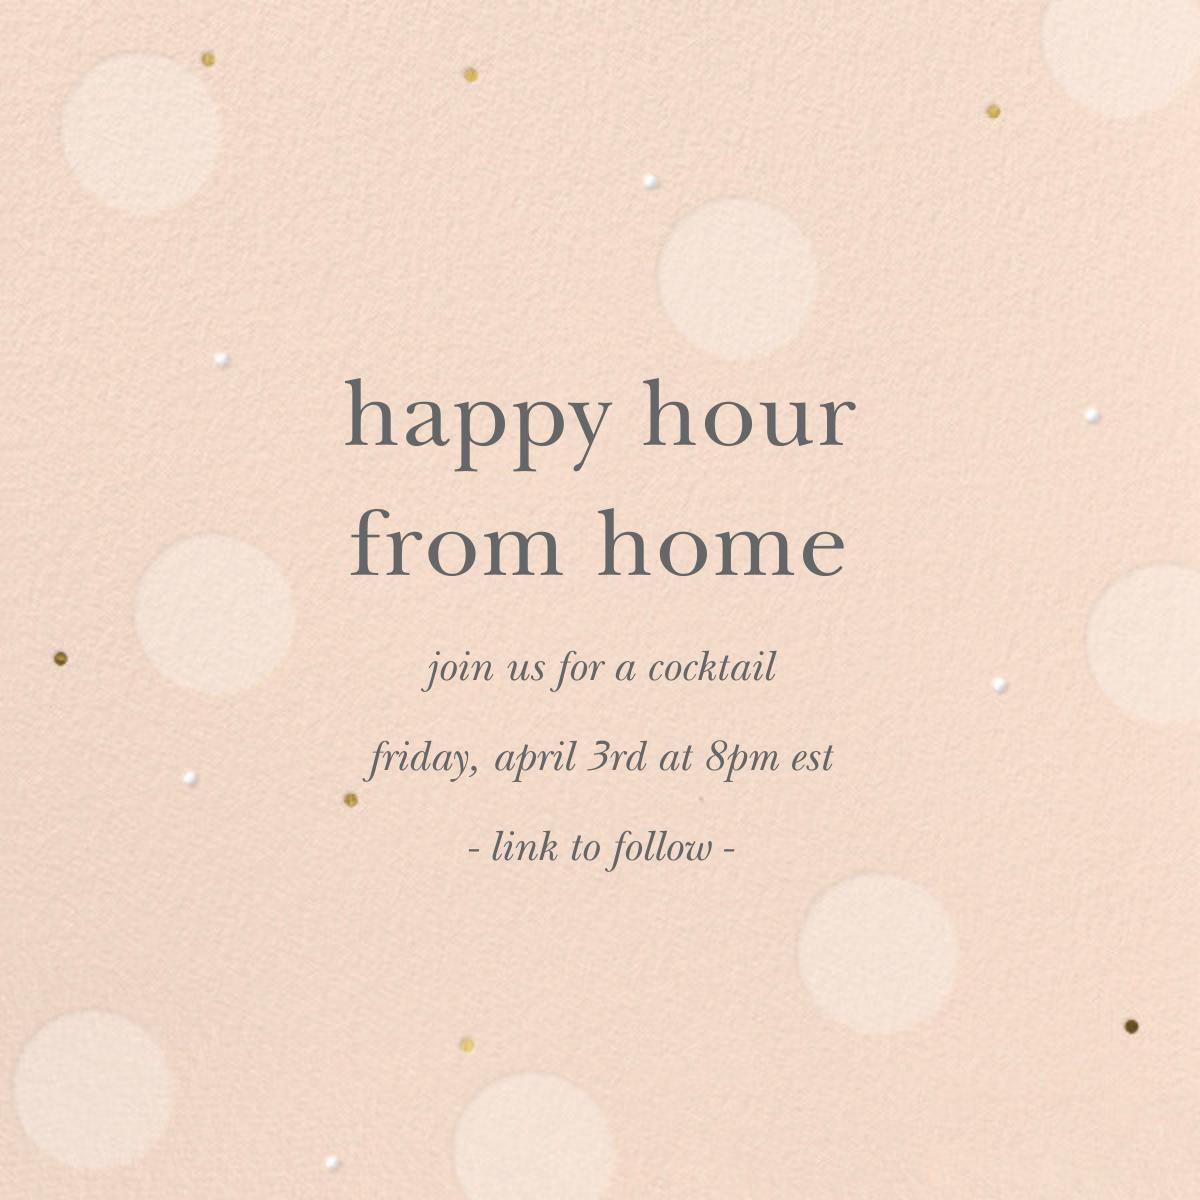 Digital Bubbles - Sugar Paper - Happy hour